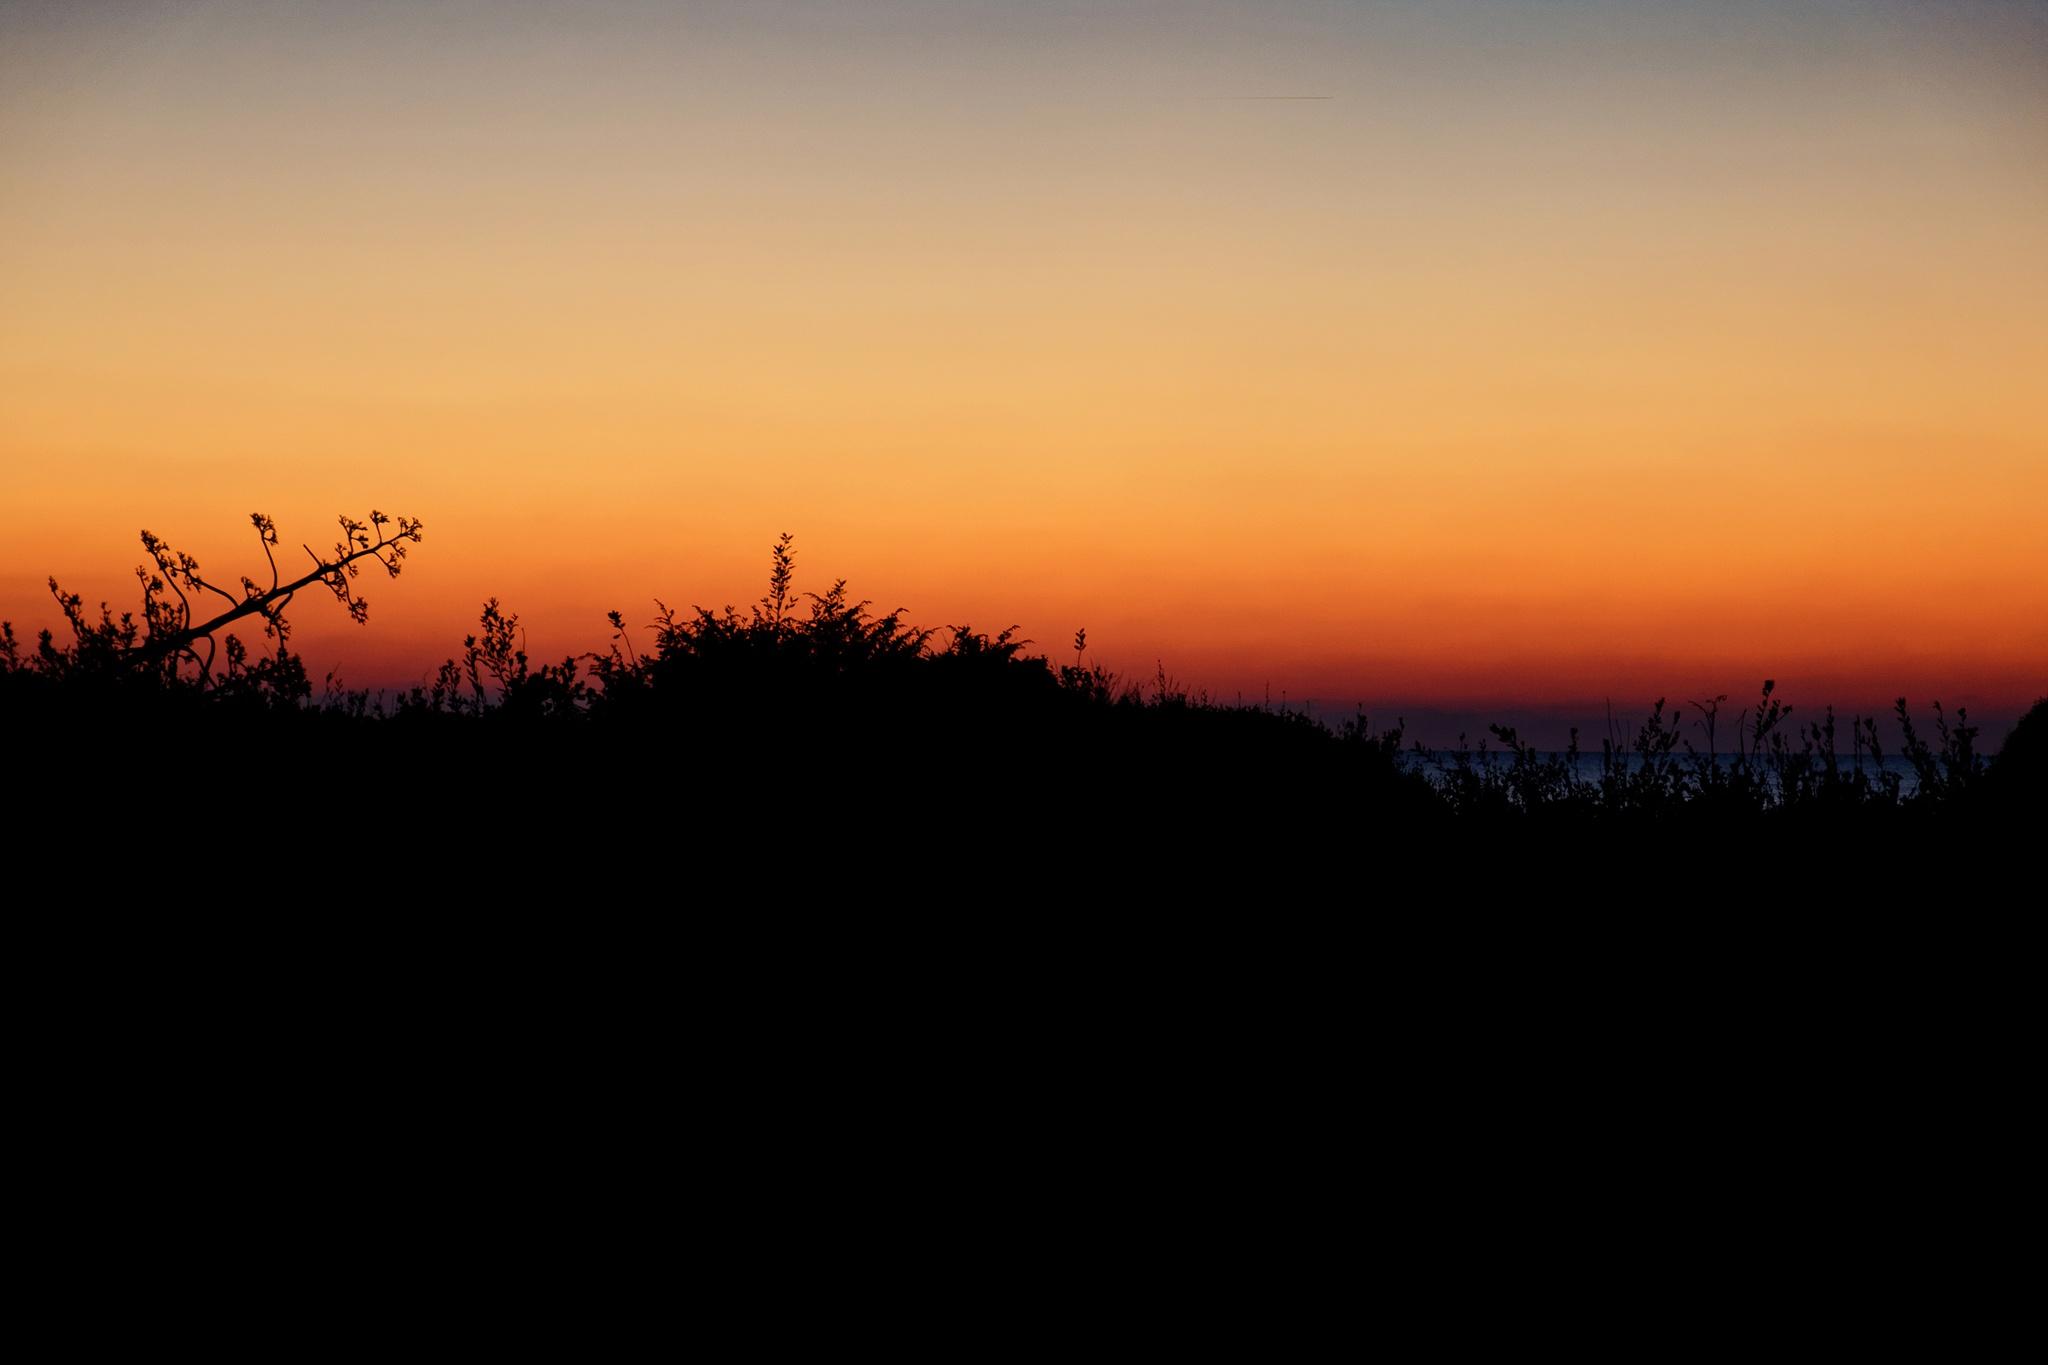 sunset on the dunes by Roberto Scordino